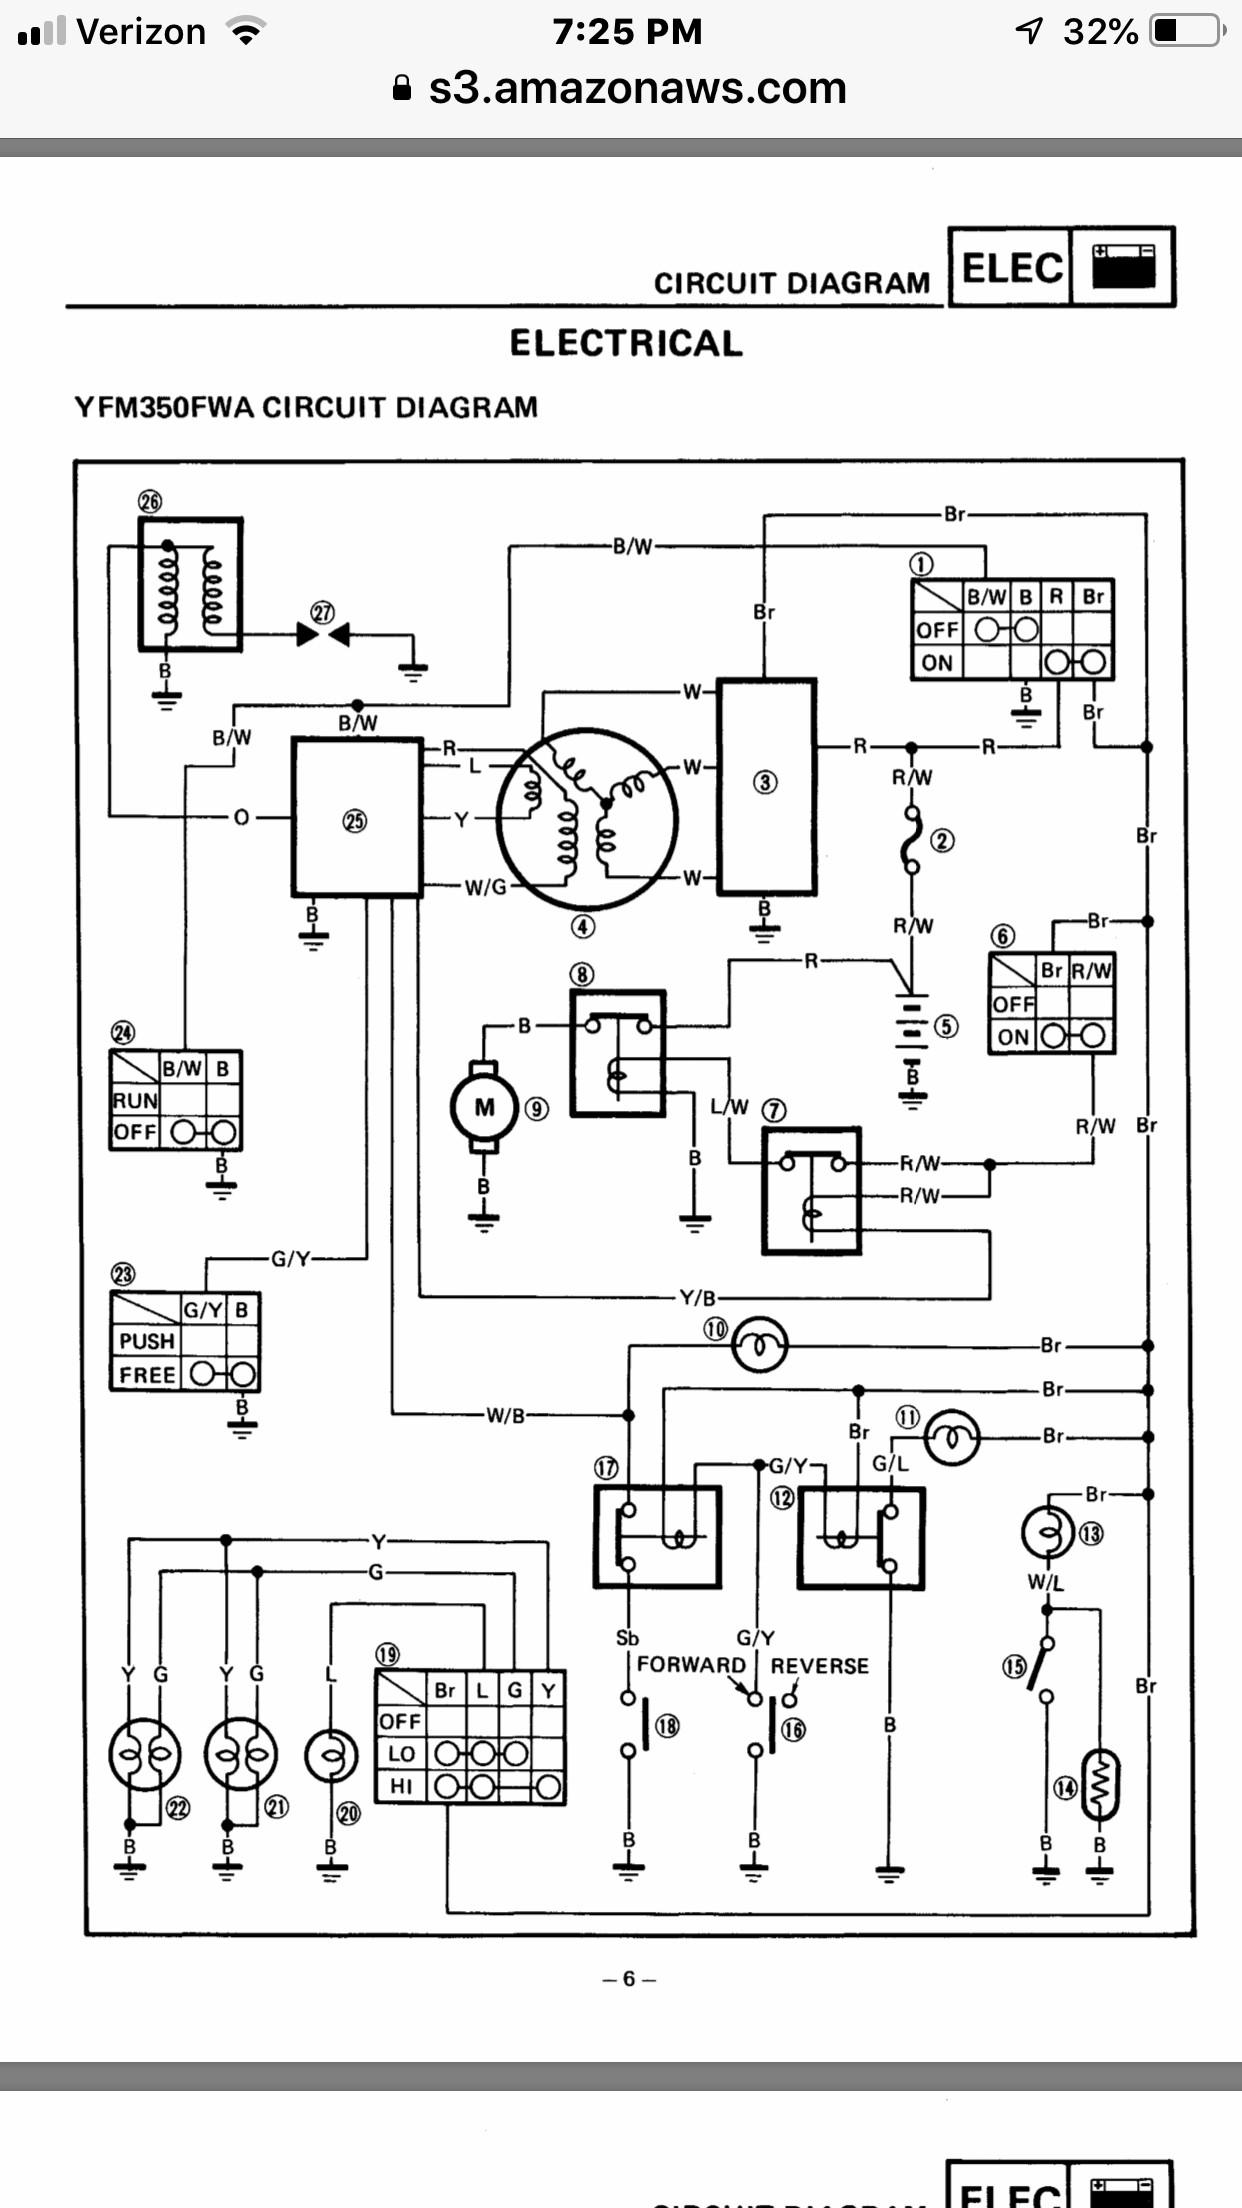 Yamaha Big Bear 350 Electric Diagram [diagram] 2001 Bear Tracker Wiring Diagram Full Version Hd Quality Wiring Diagram Of Yamaha Big Bear 350 Electric Diagram